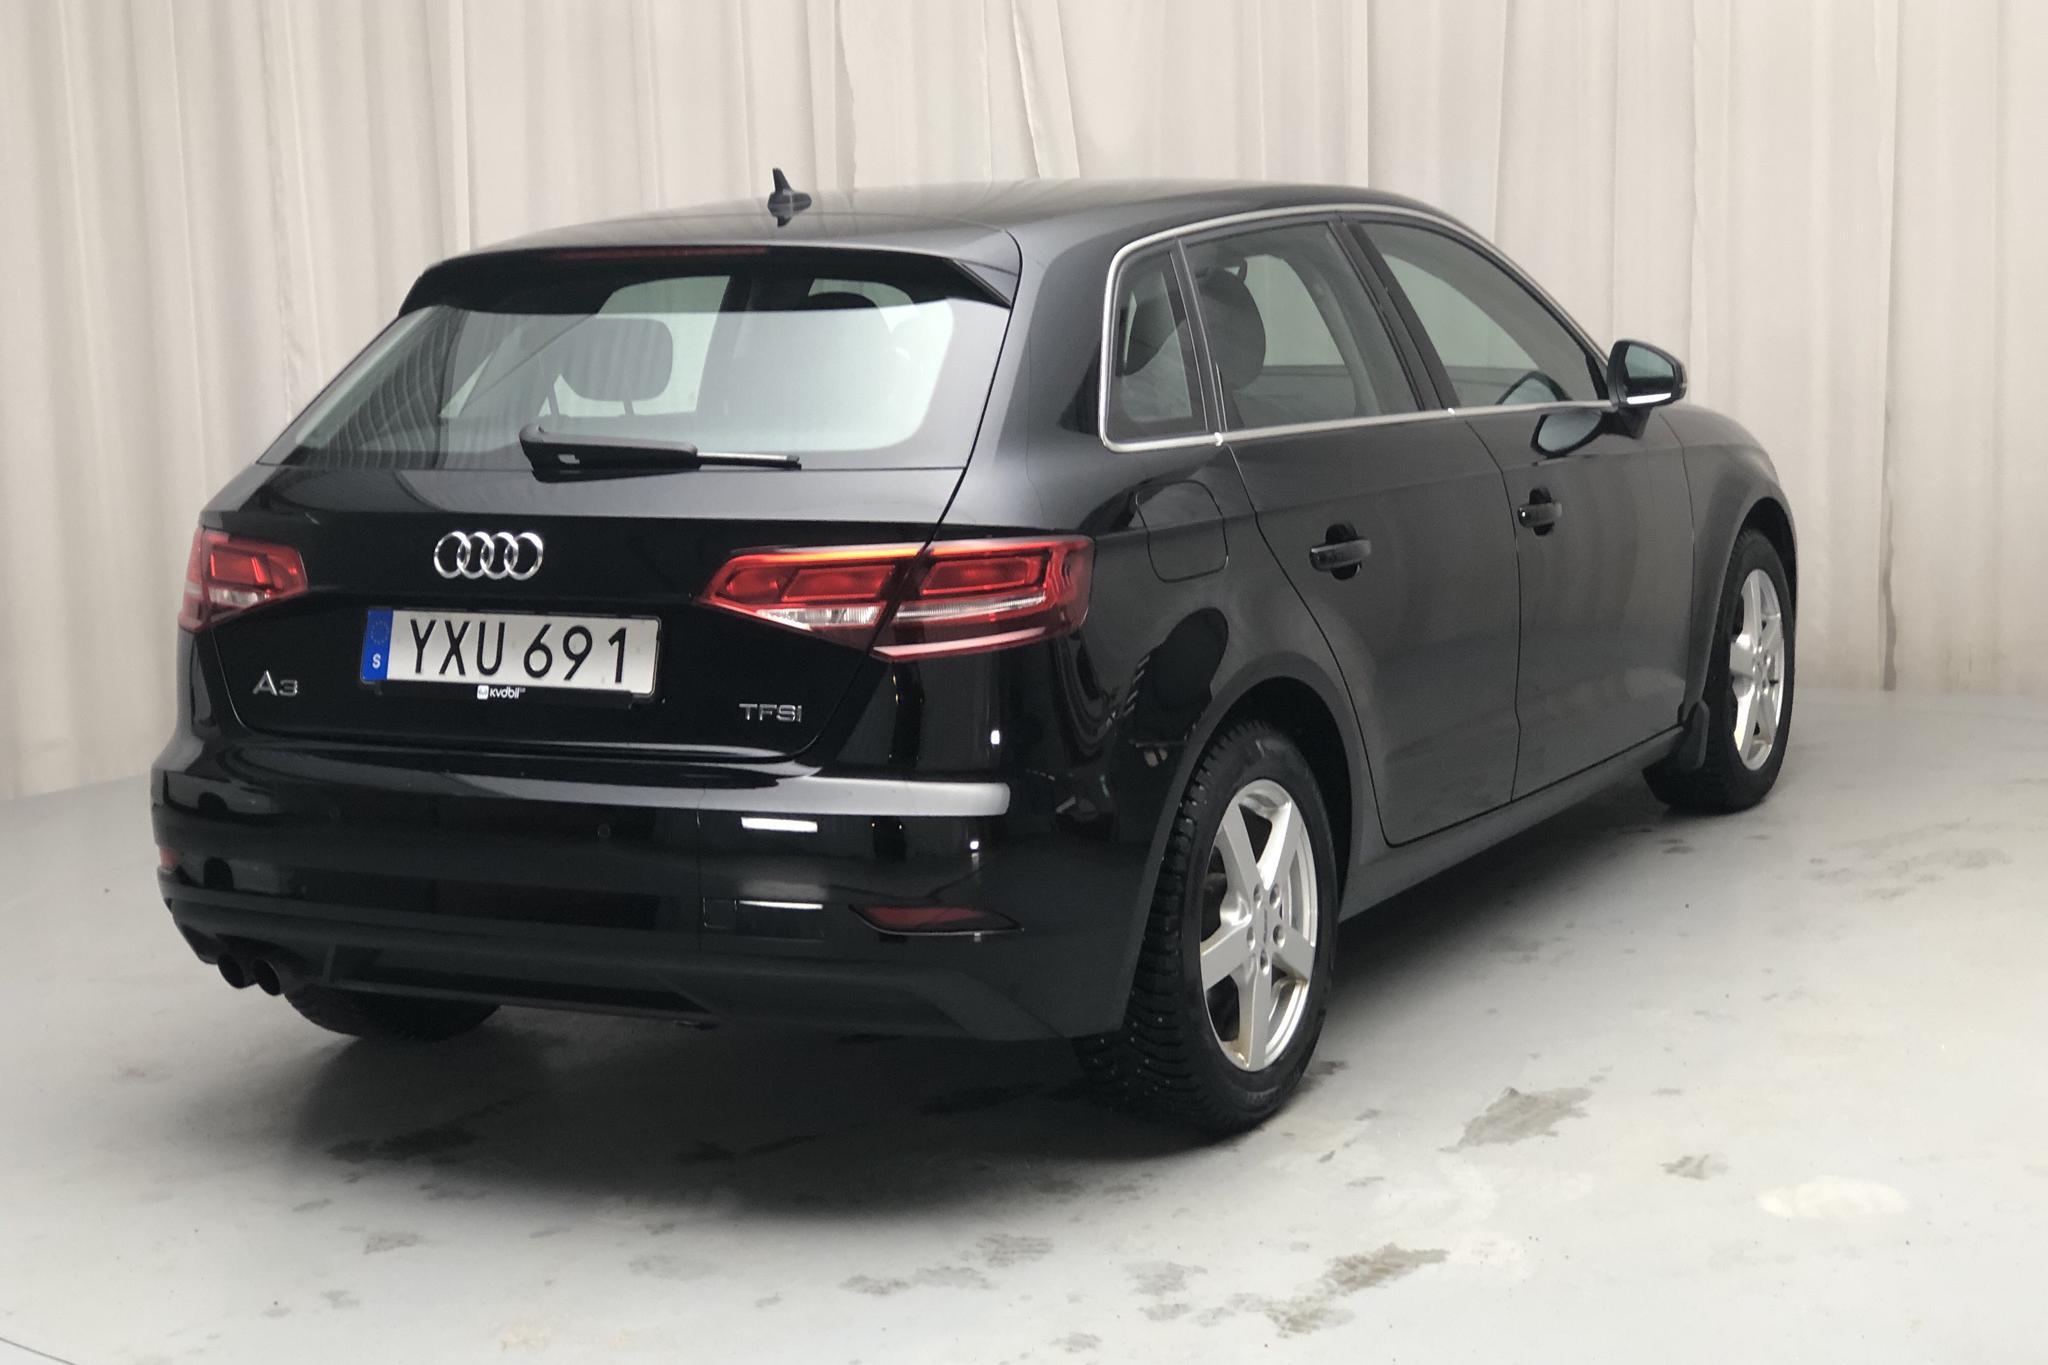 Audi A3 1.5 TFSI Sportback (150hk) - 5 997 mil - Manuell - svart - 2018